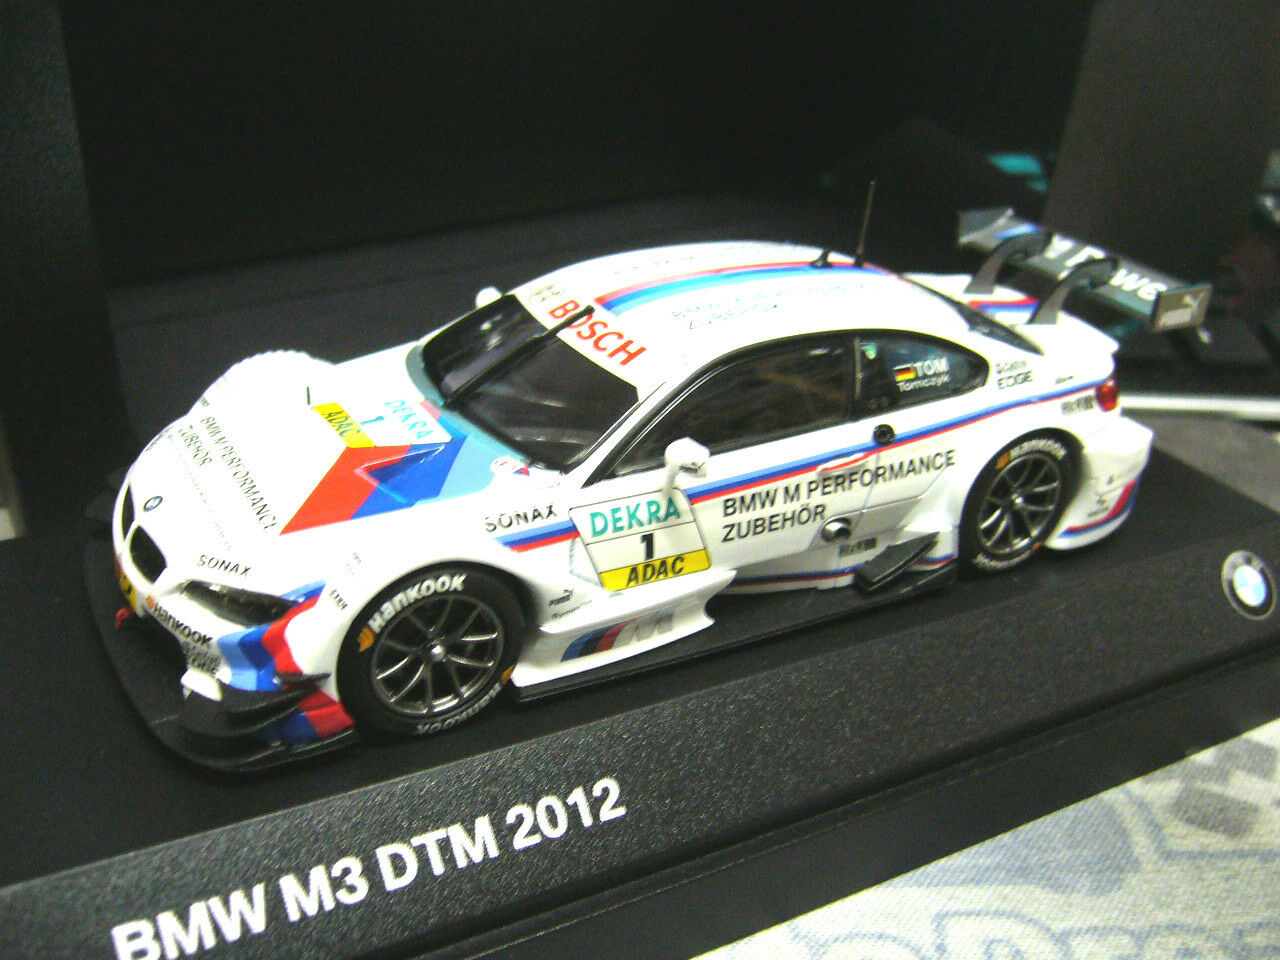 BMW m3 e92 COUPE DTM 2012 tomczyk  1 M performance industrie Bmw Minichamps 1 43